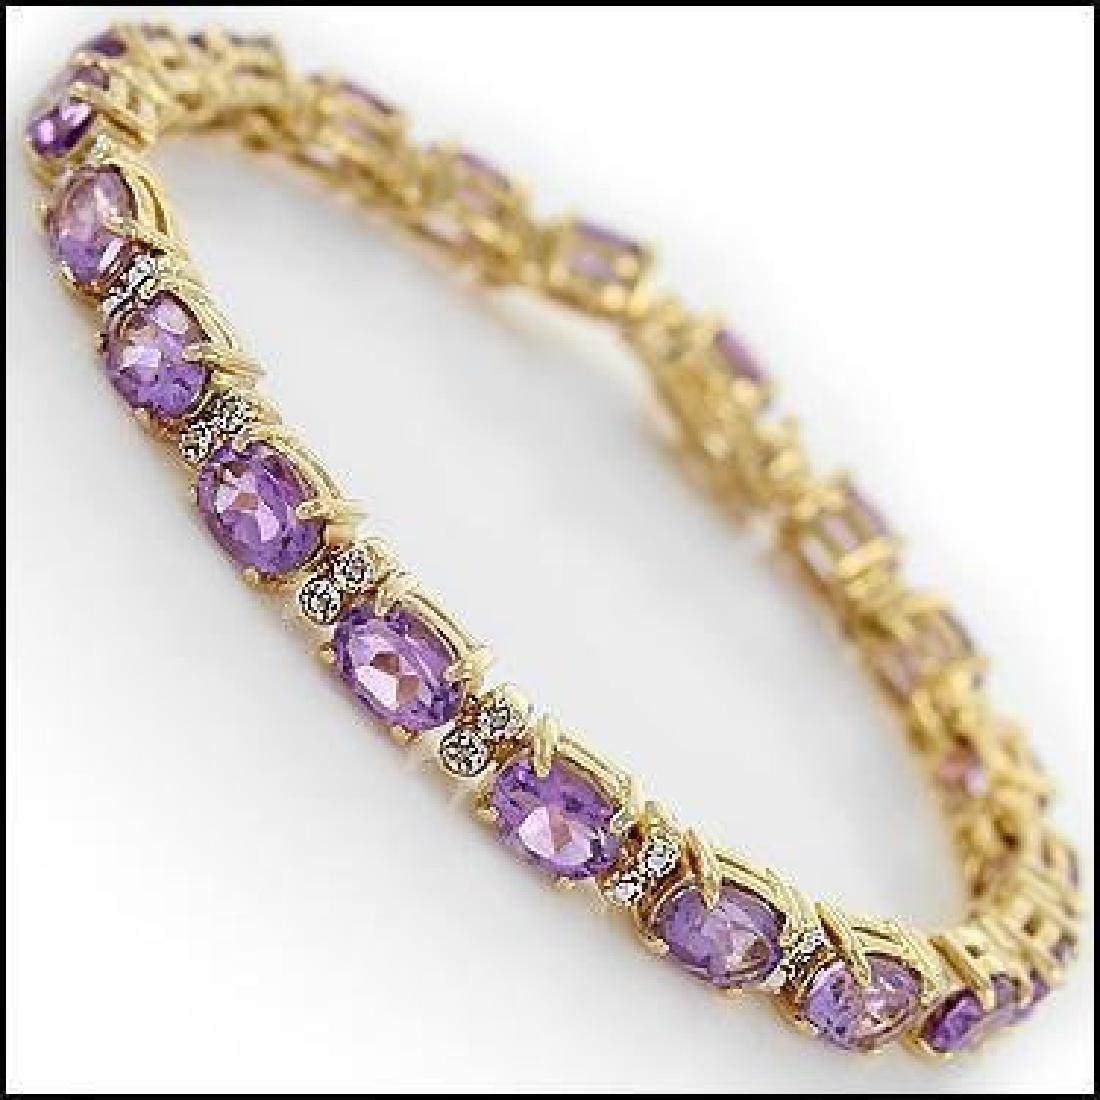 14.88 Ct Amethyst & Diamond Designer Bracelet $1,245